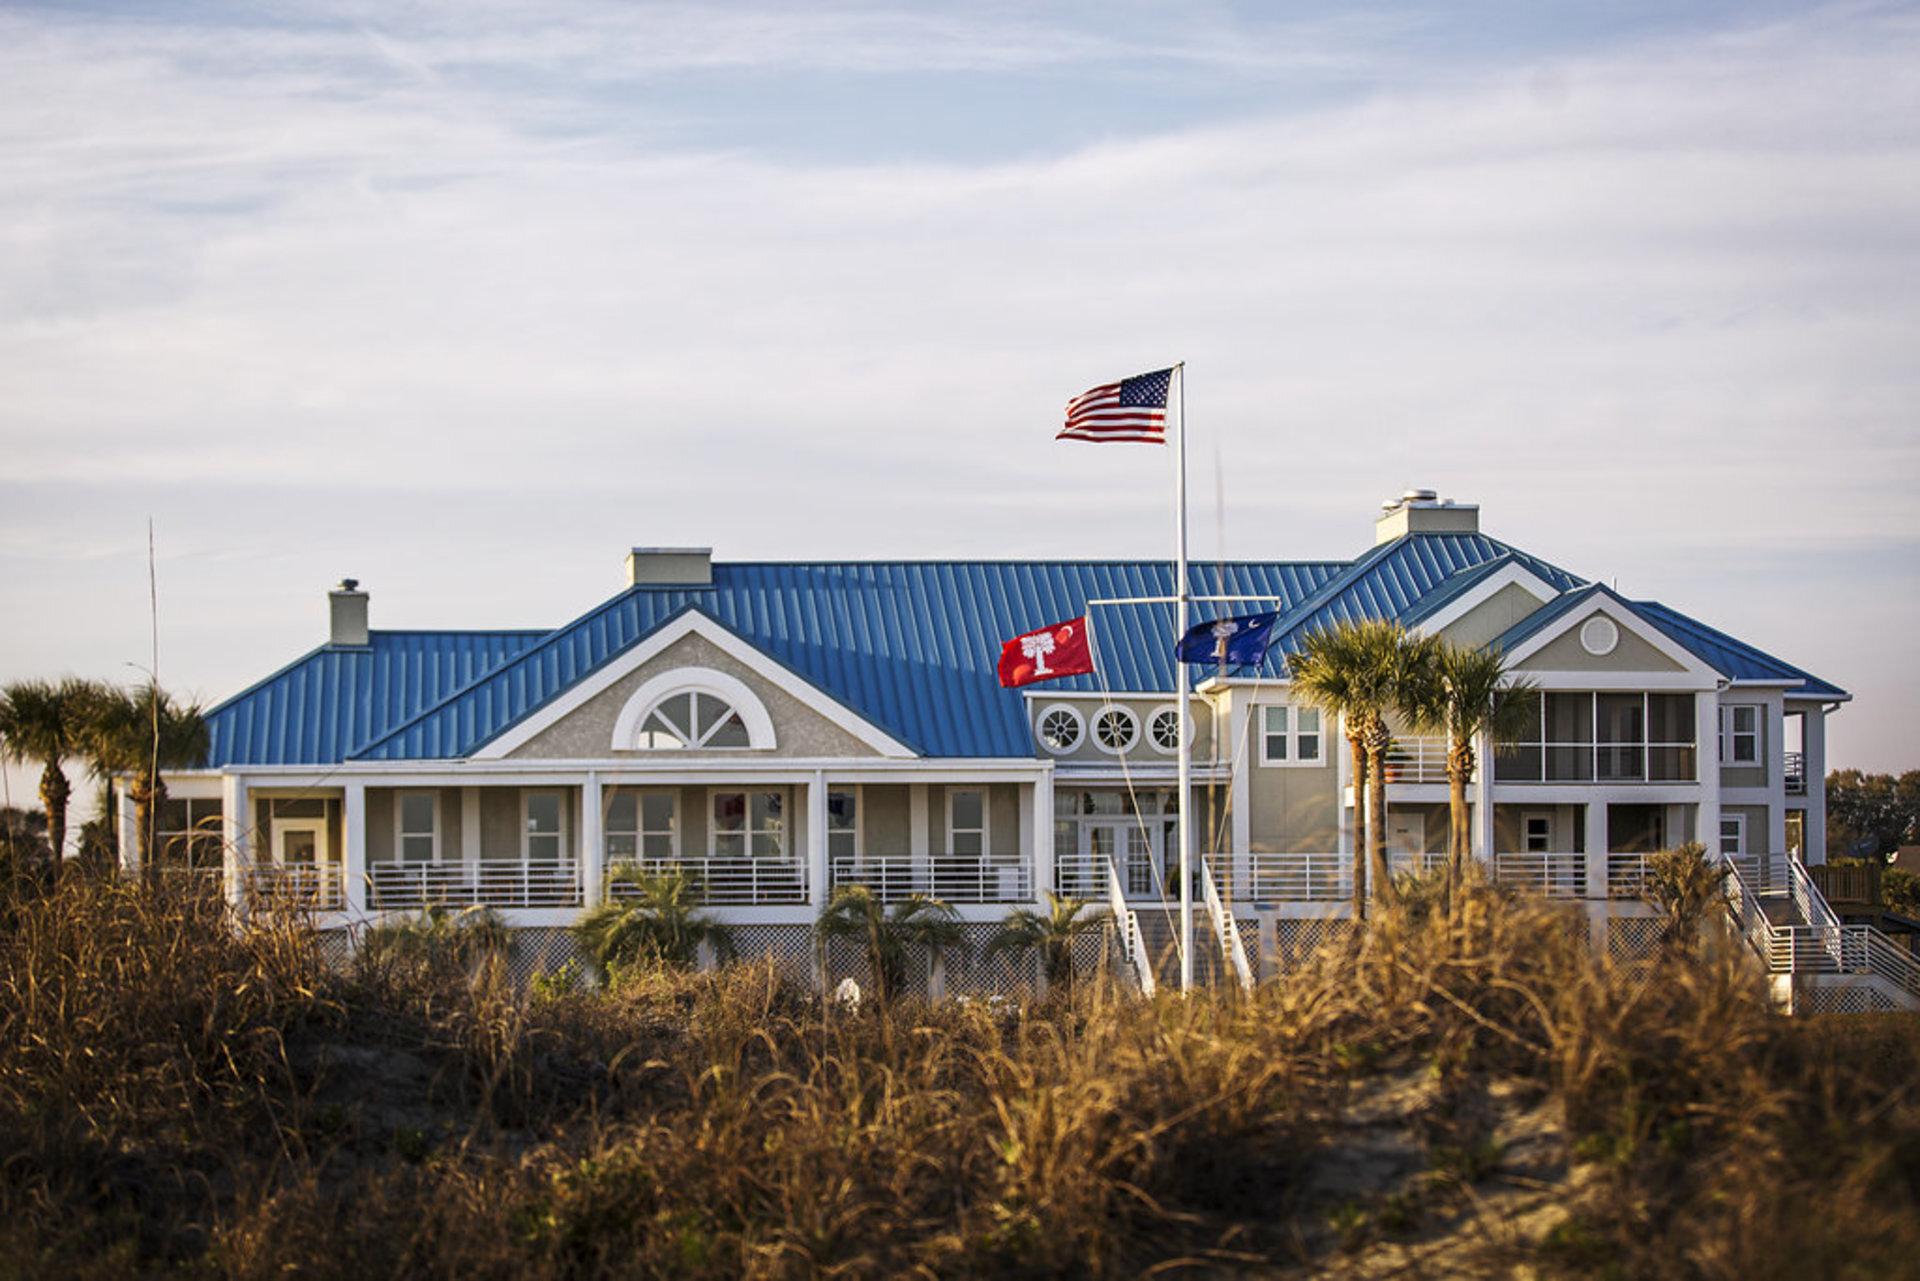 Citadel Beach House